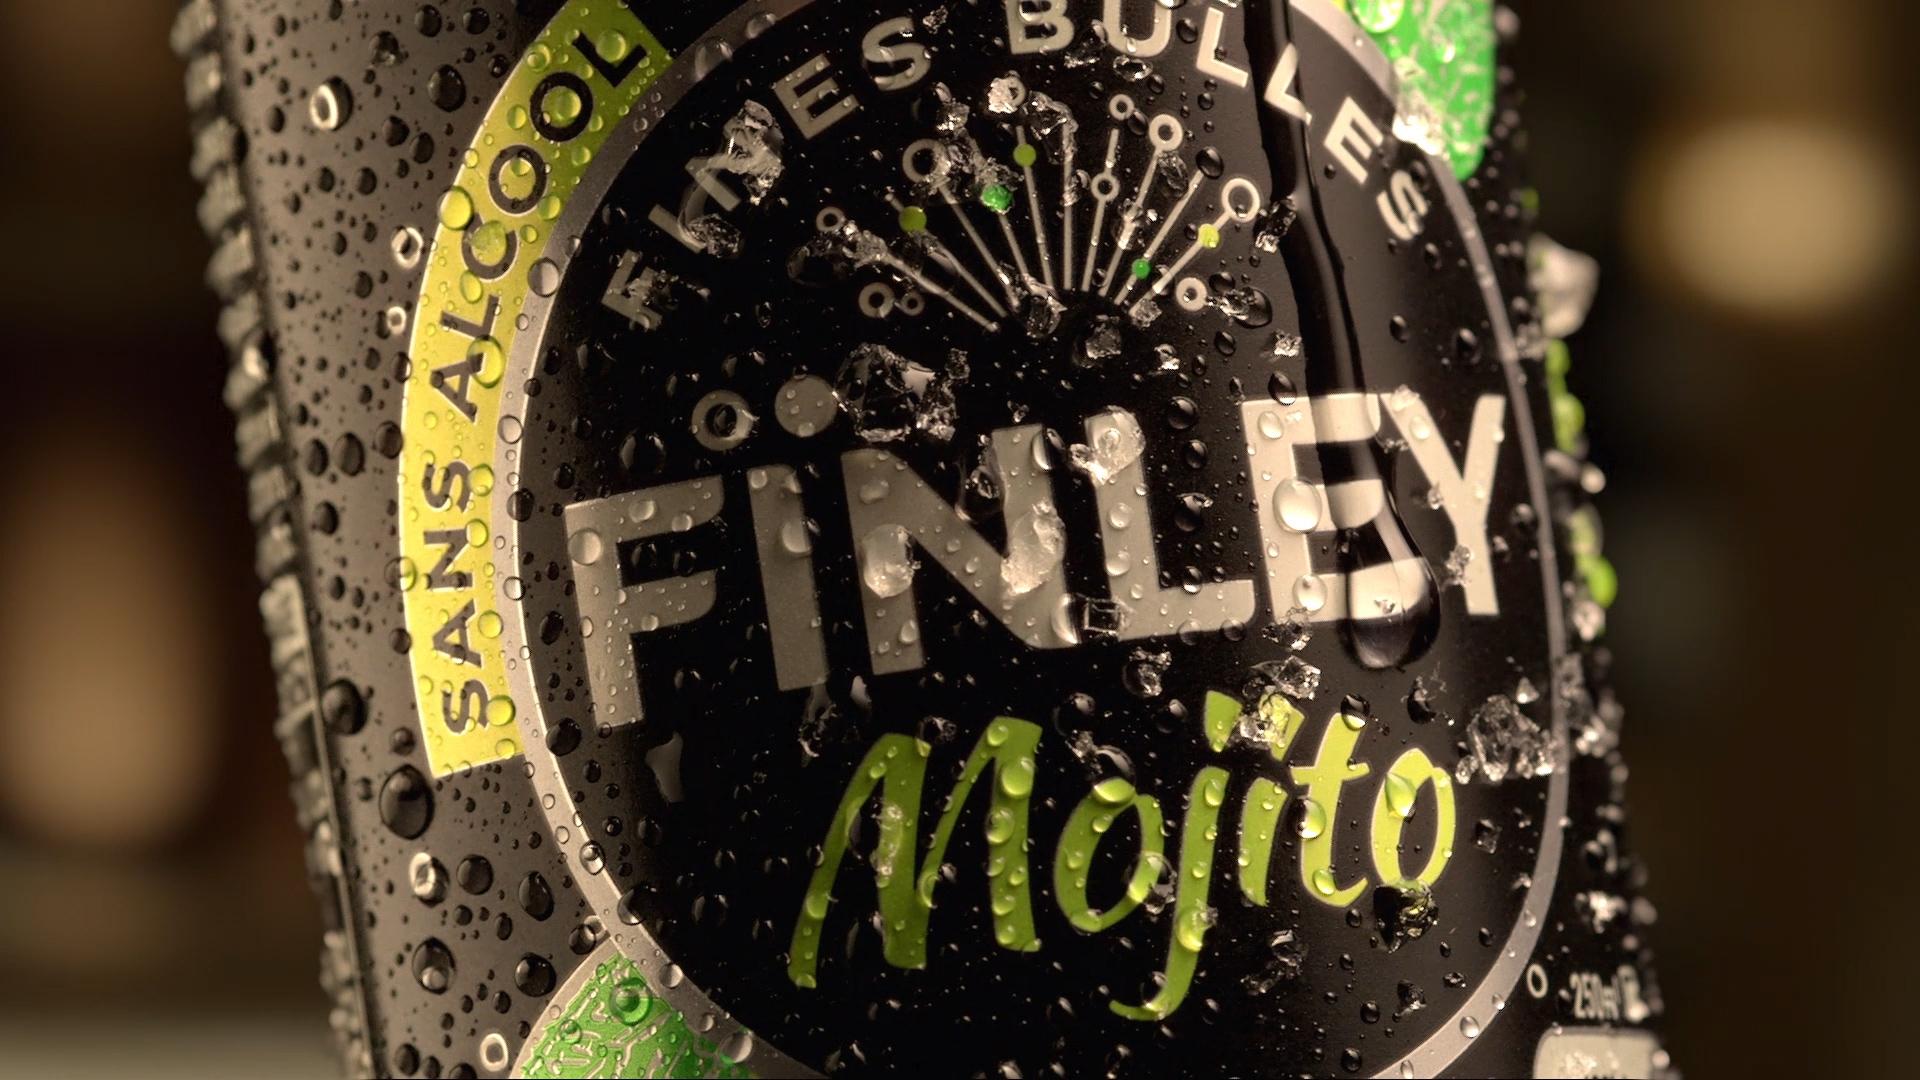 Finley Mojito - Wonder / Pablo Hermida + Slow Studio (Product)